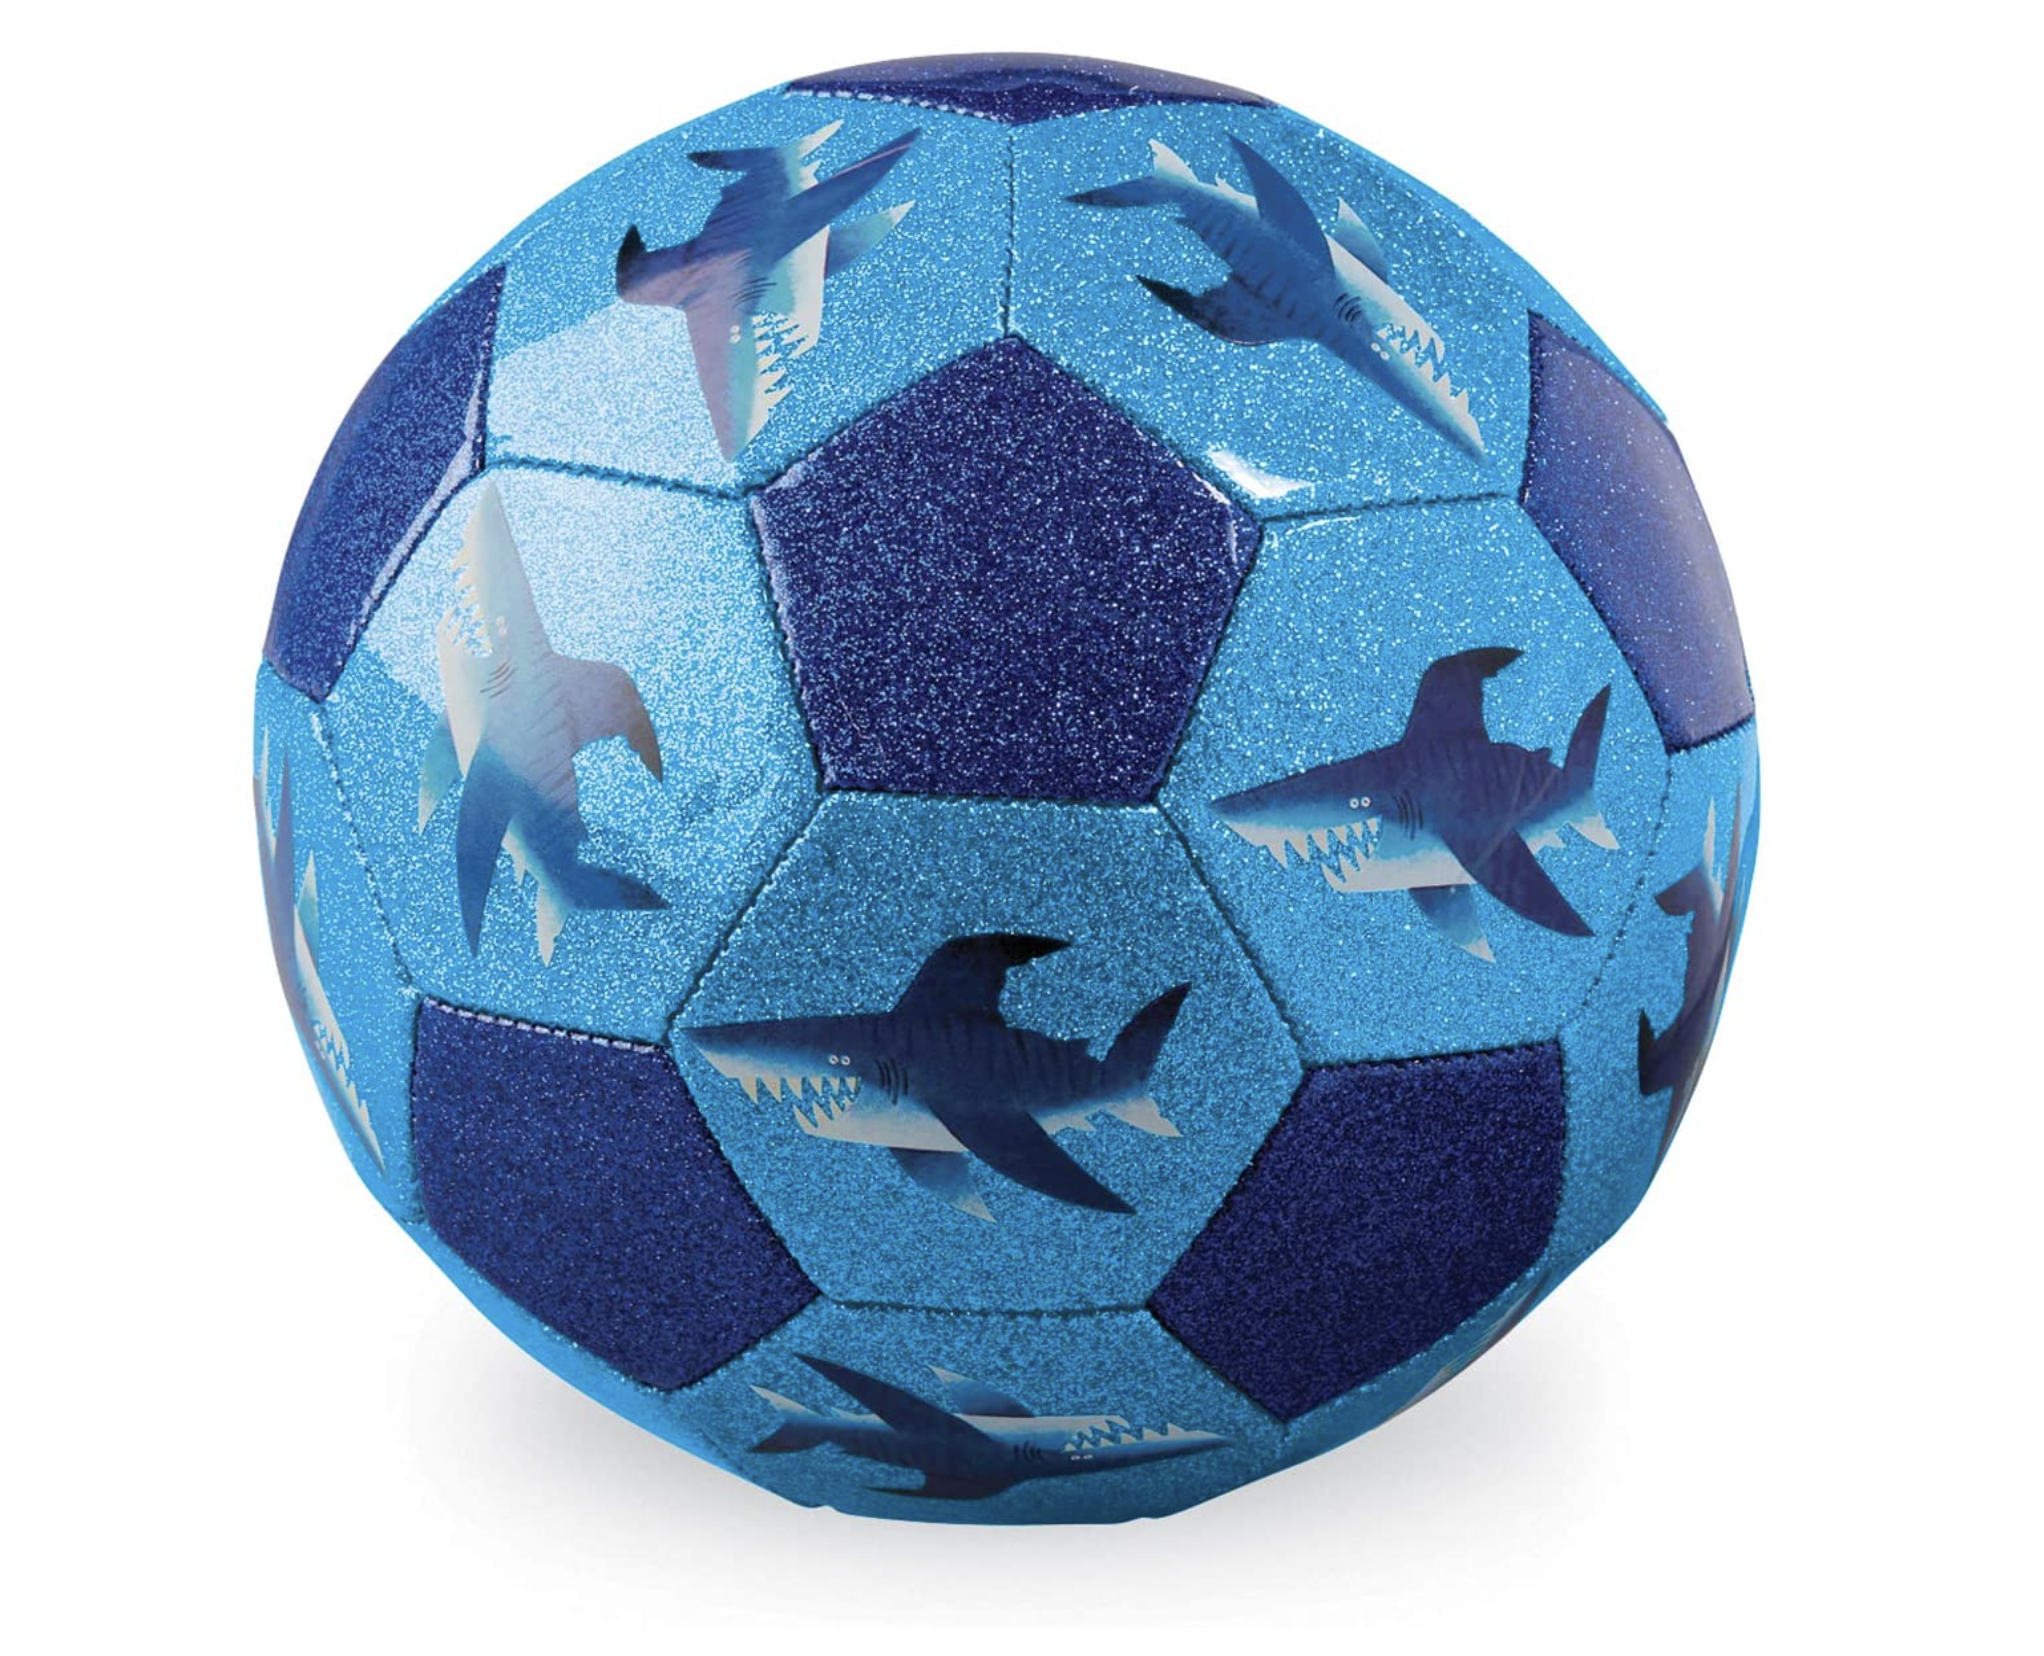 Crocodile Creek Soccer Ball - Shark City